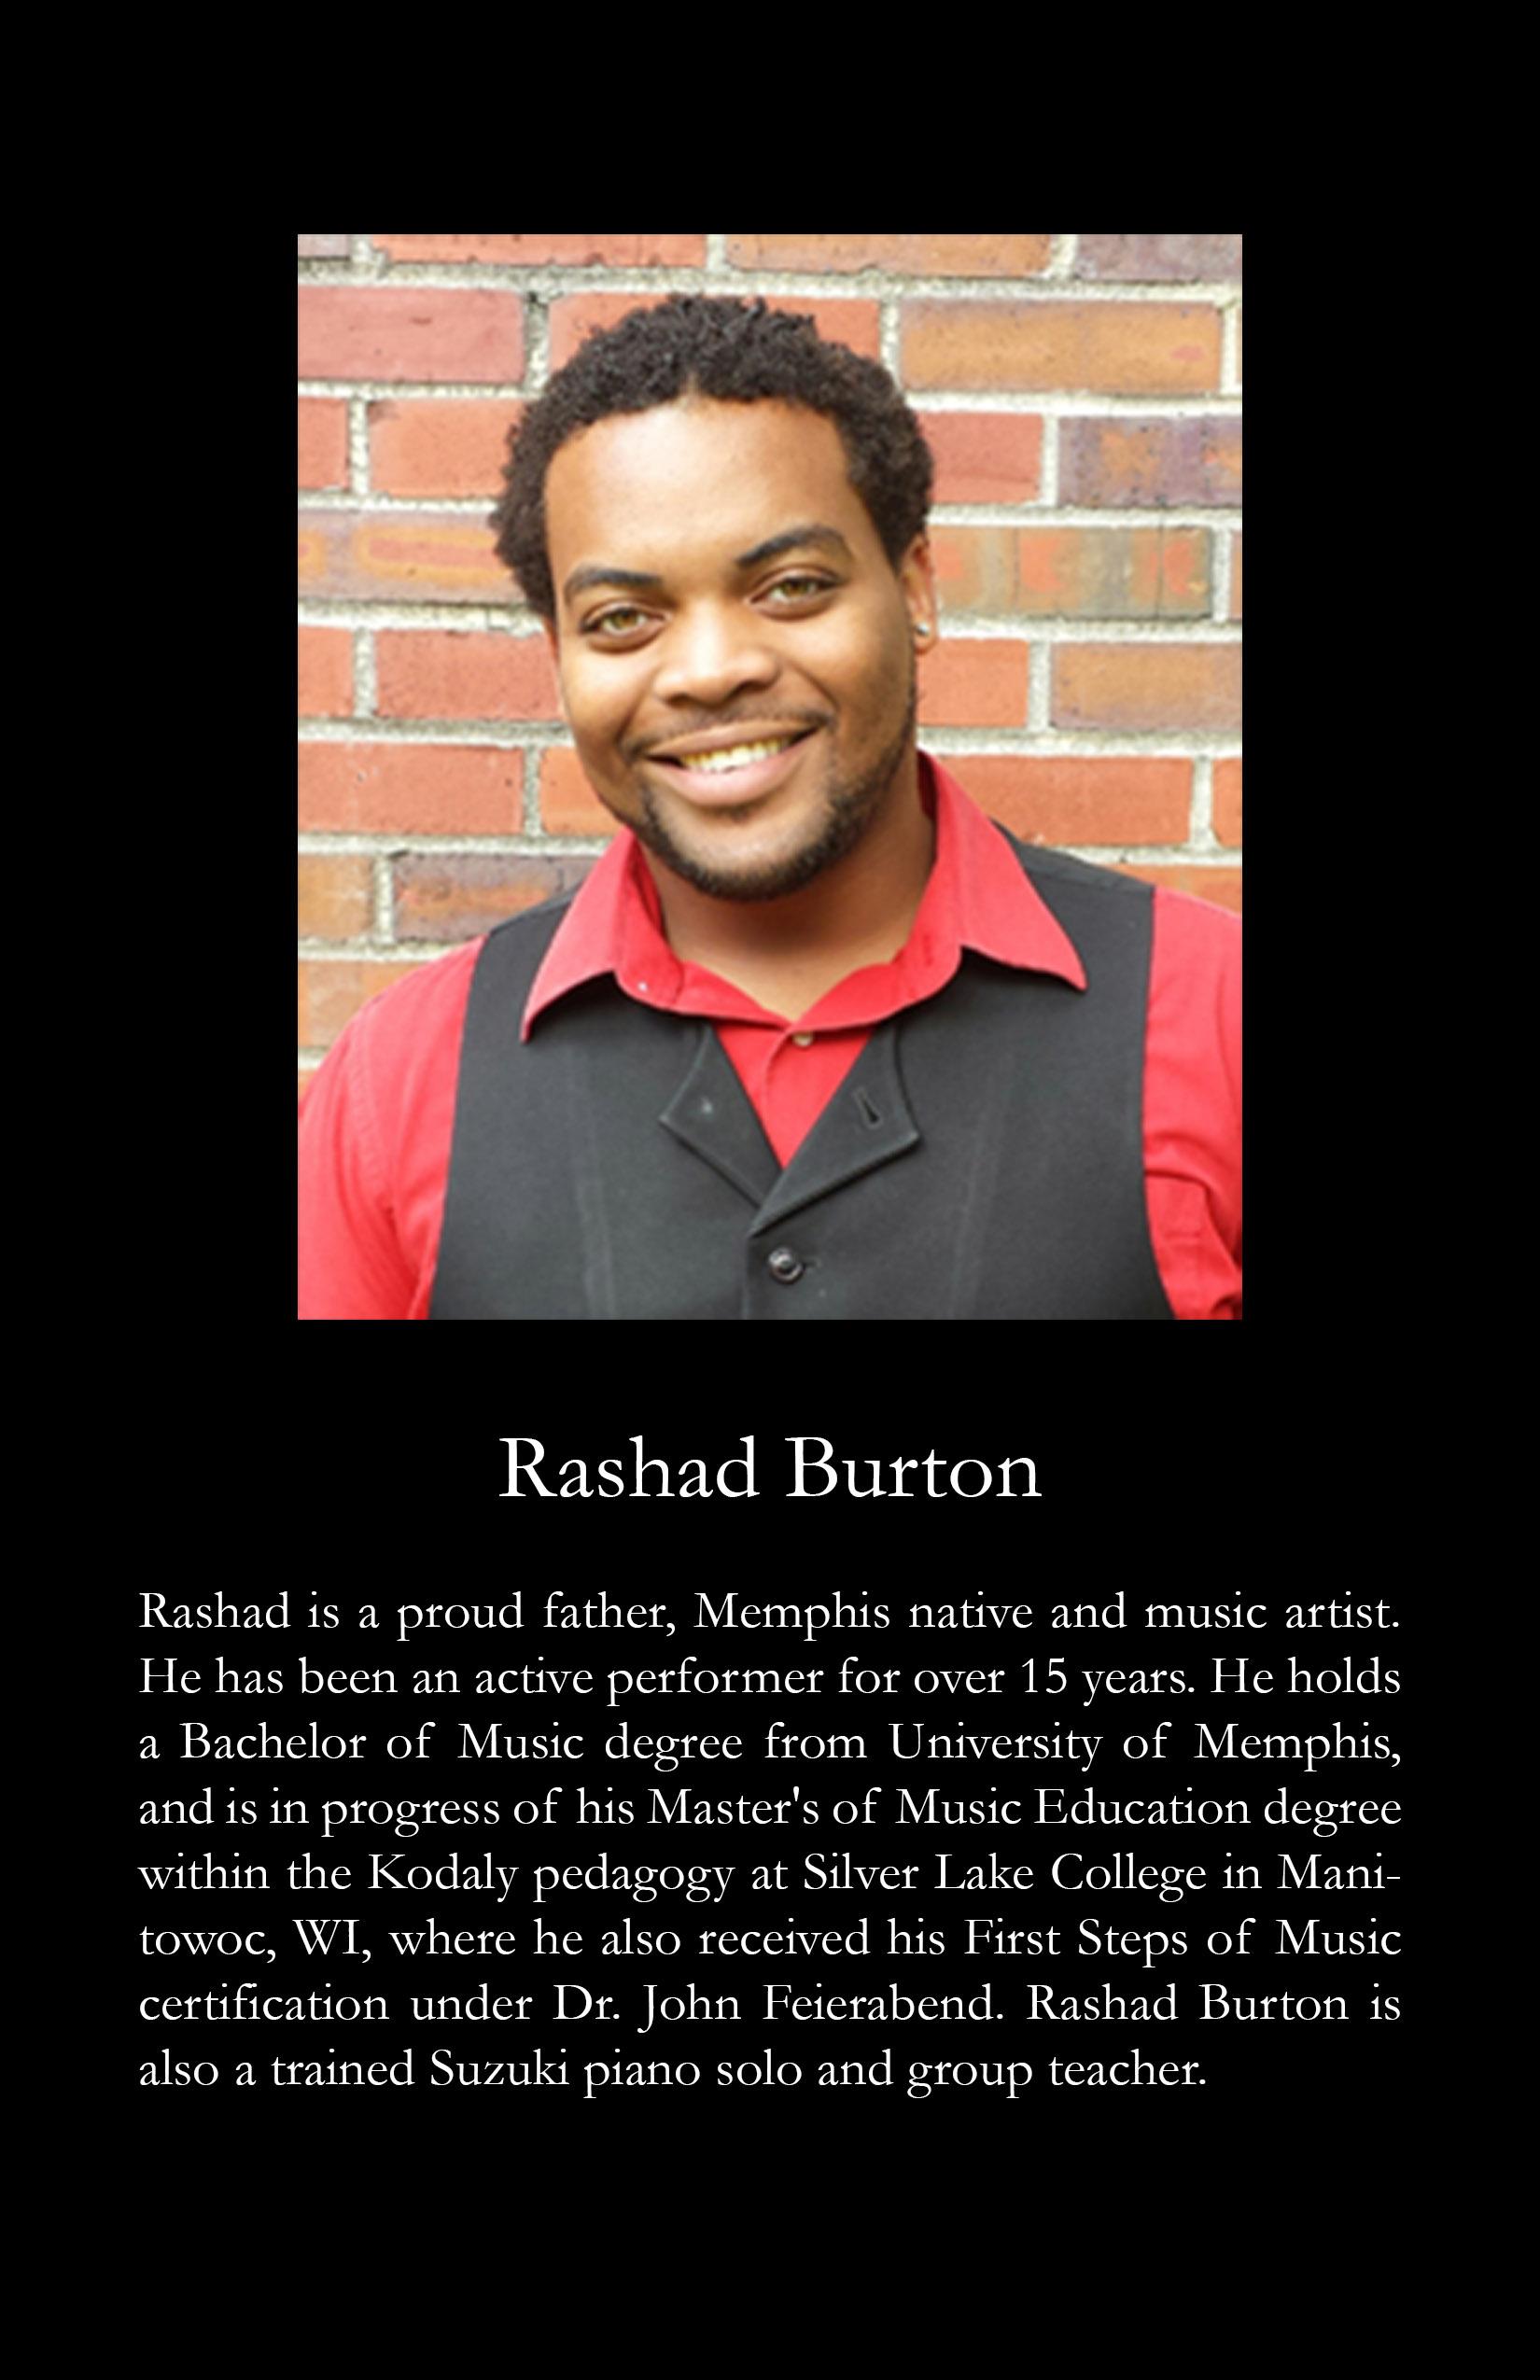 Rashad Burton.jpg